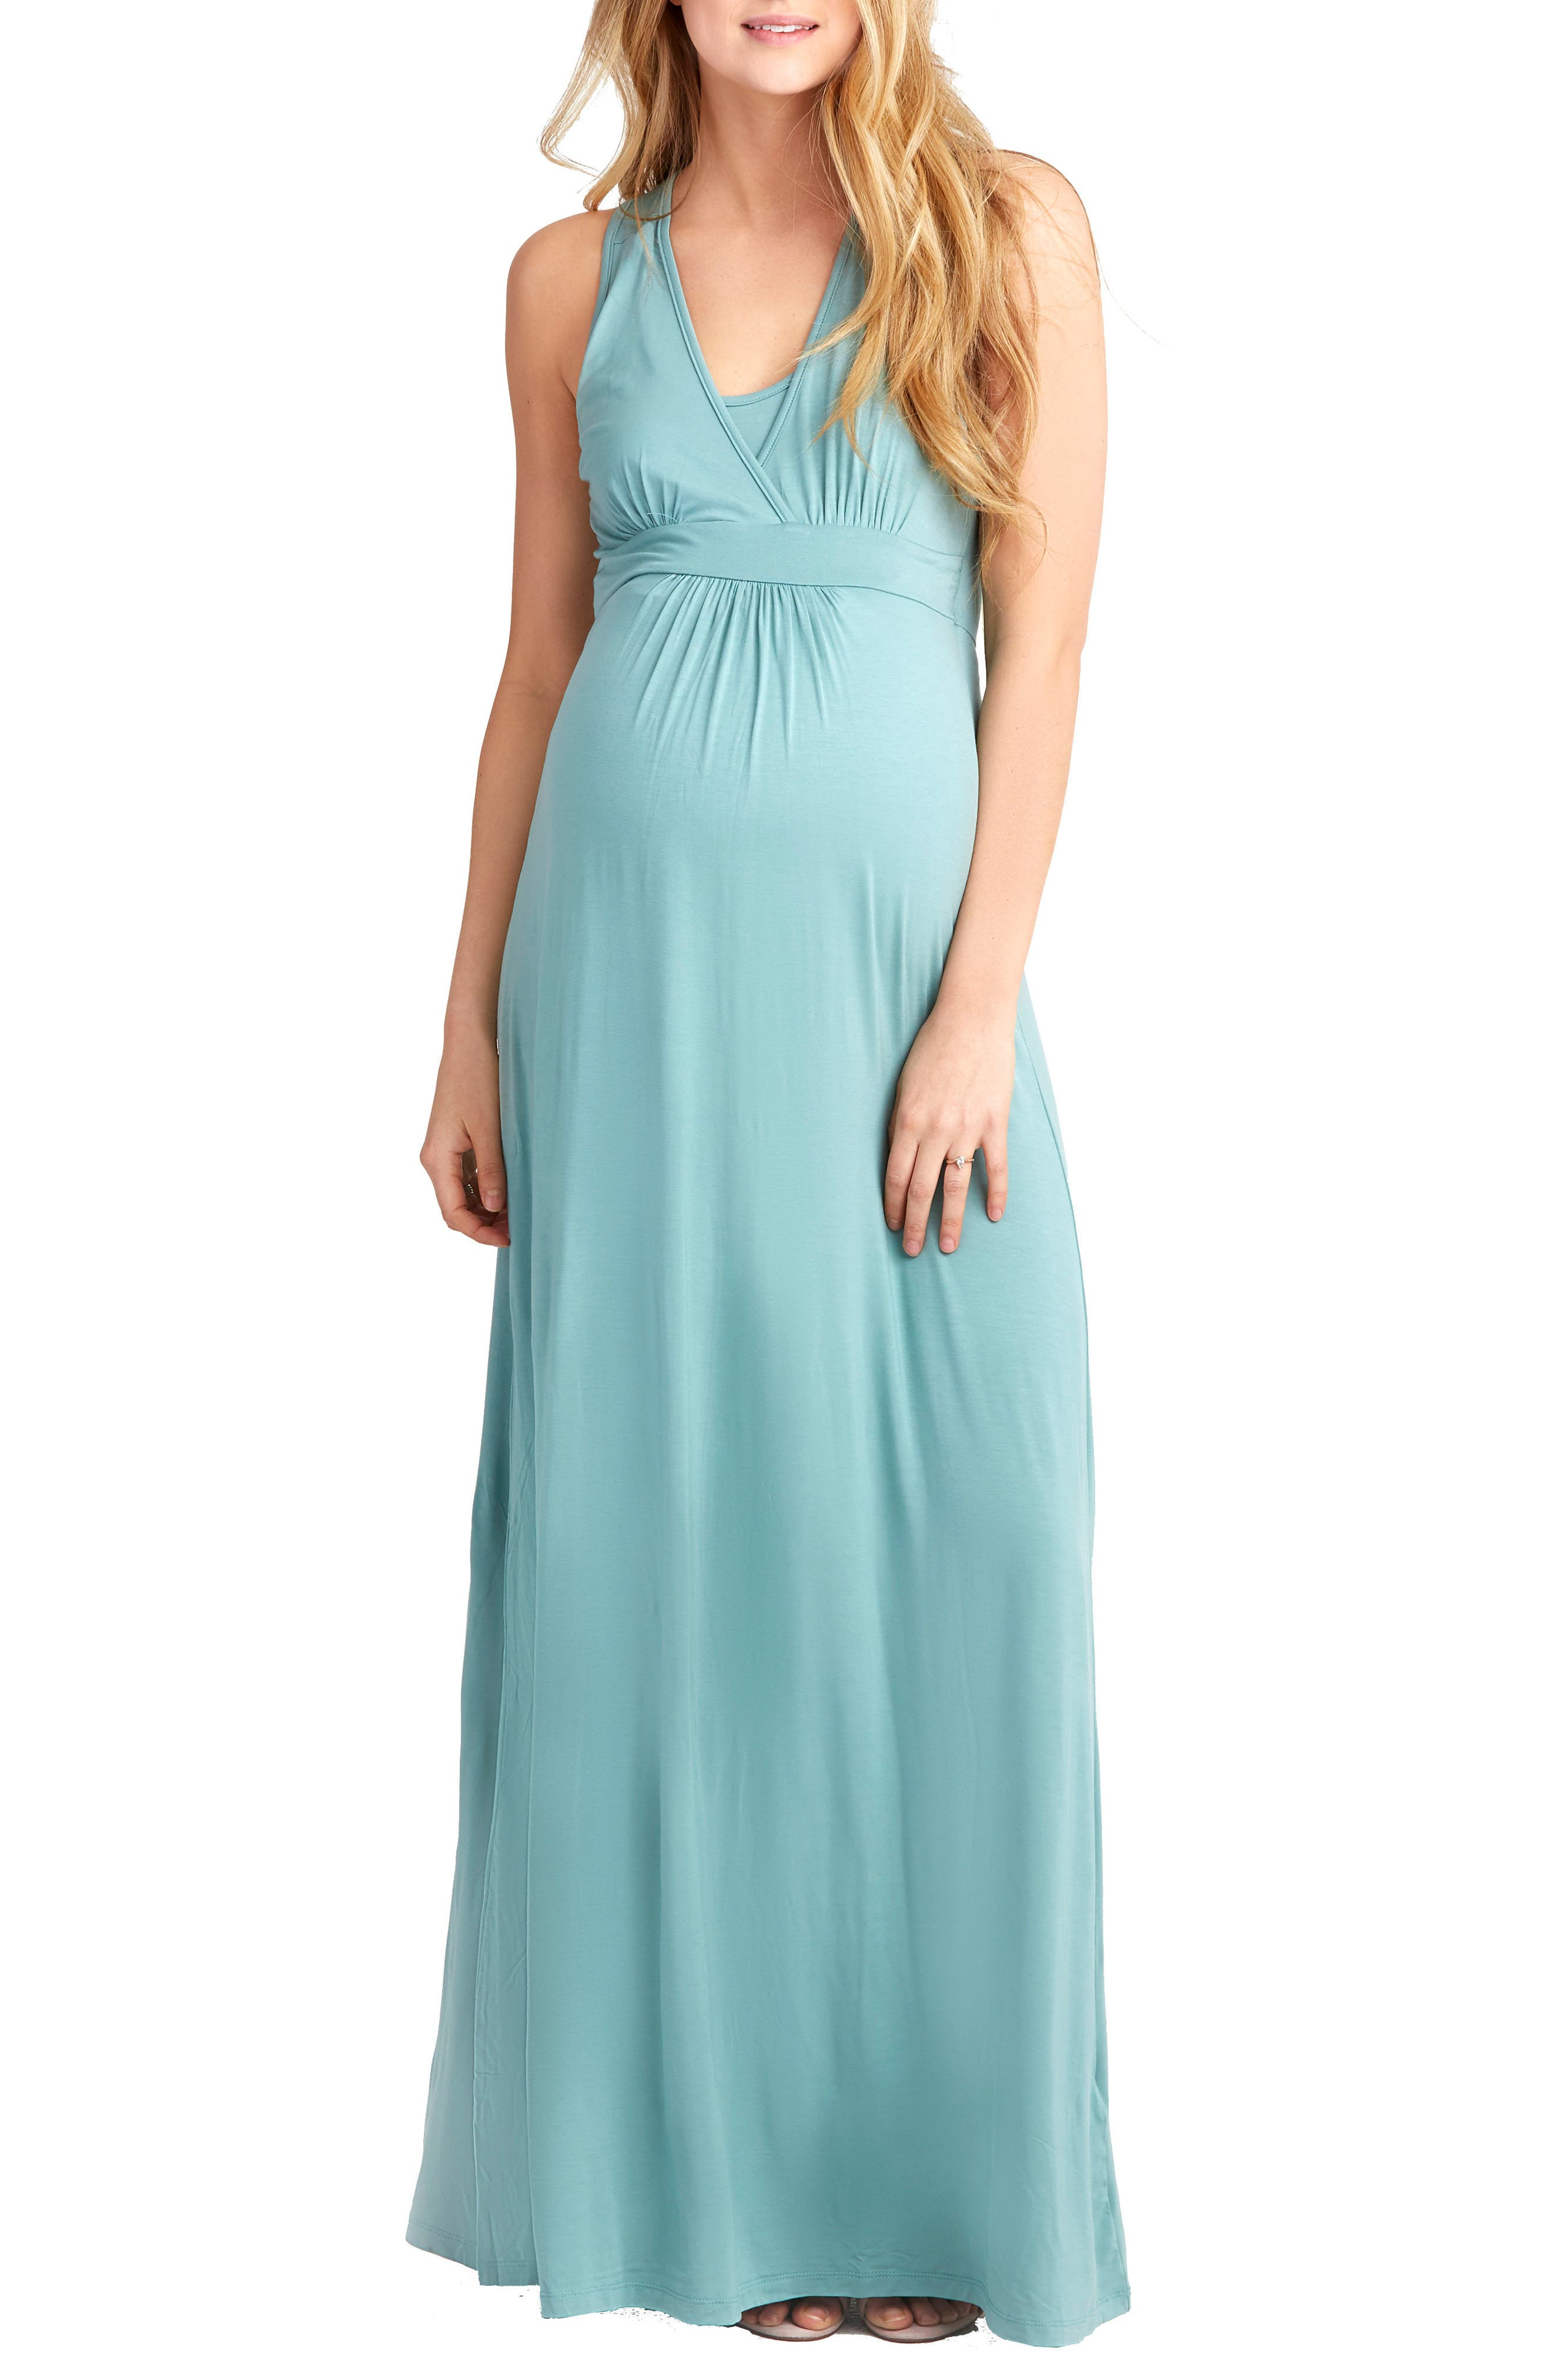 Fantastic Party Pregnancy Dresses Ideas - All Wedding Dresses ...